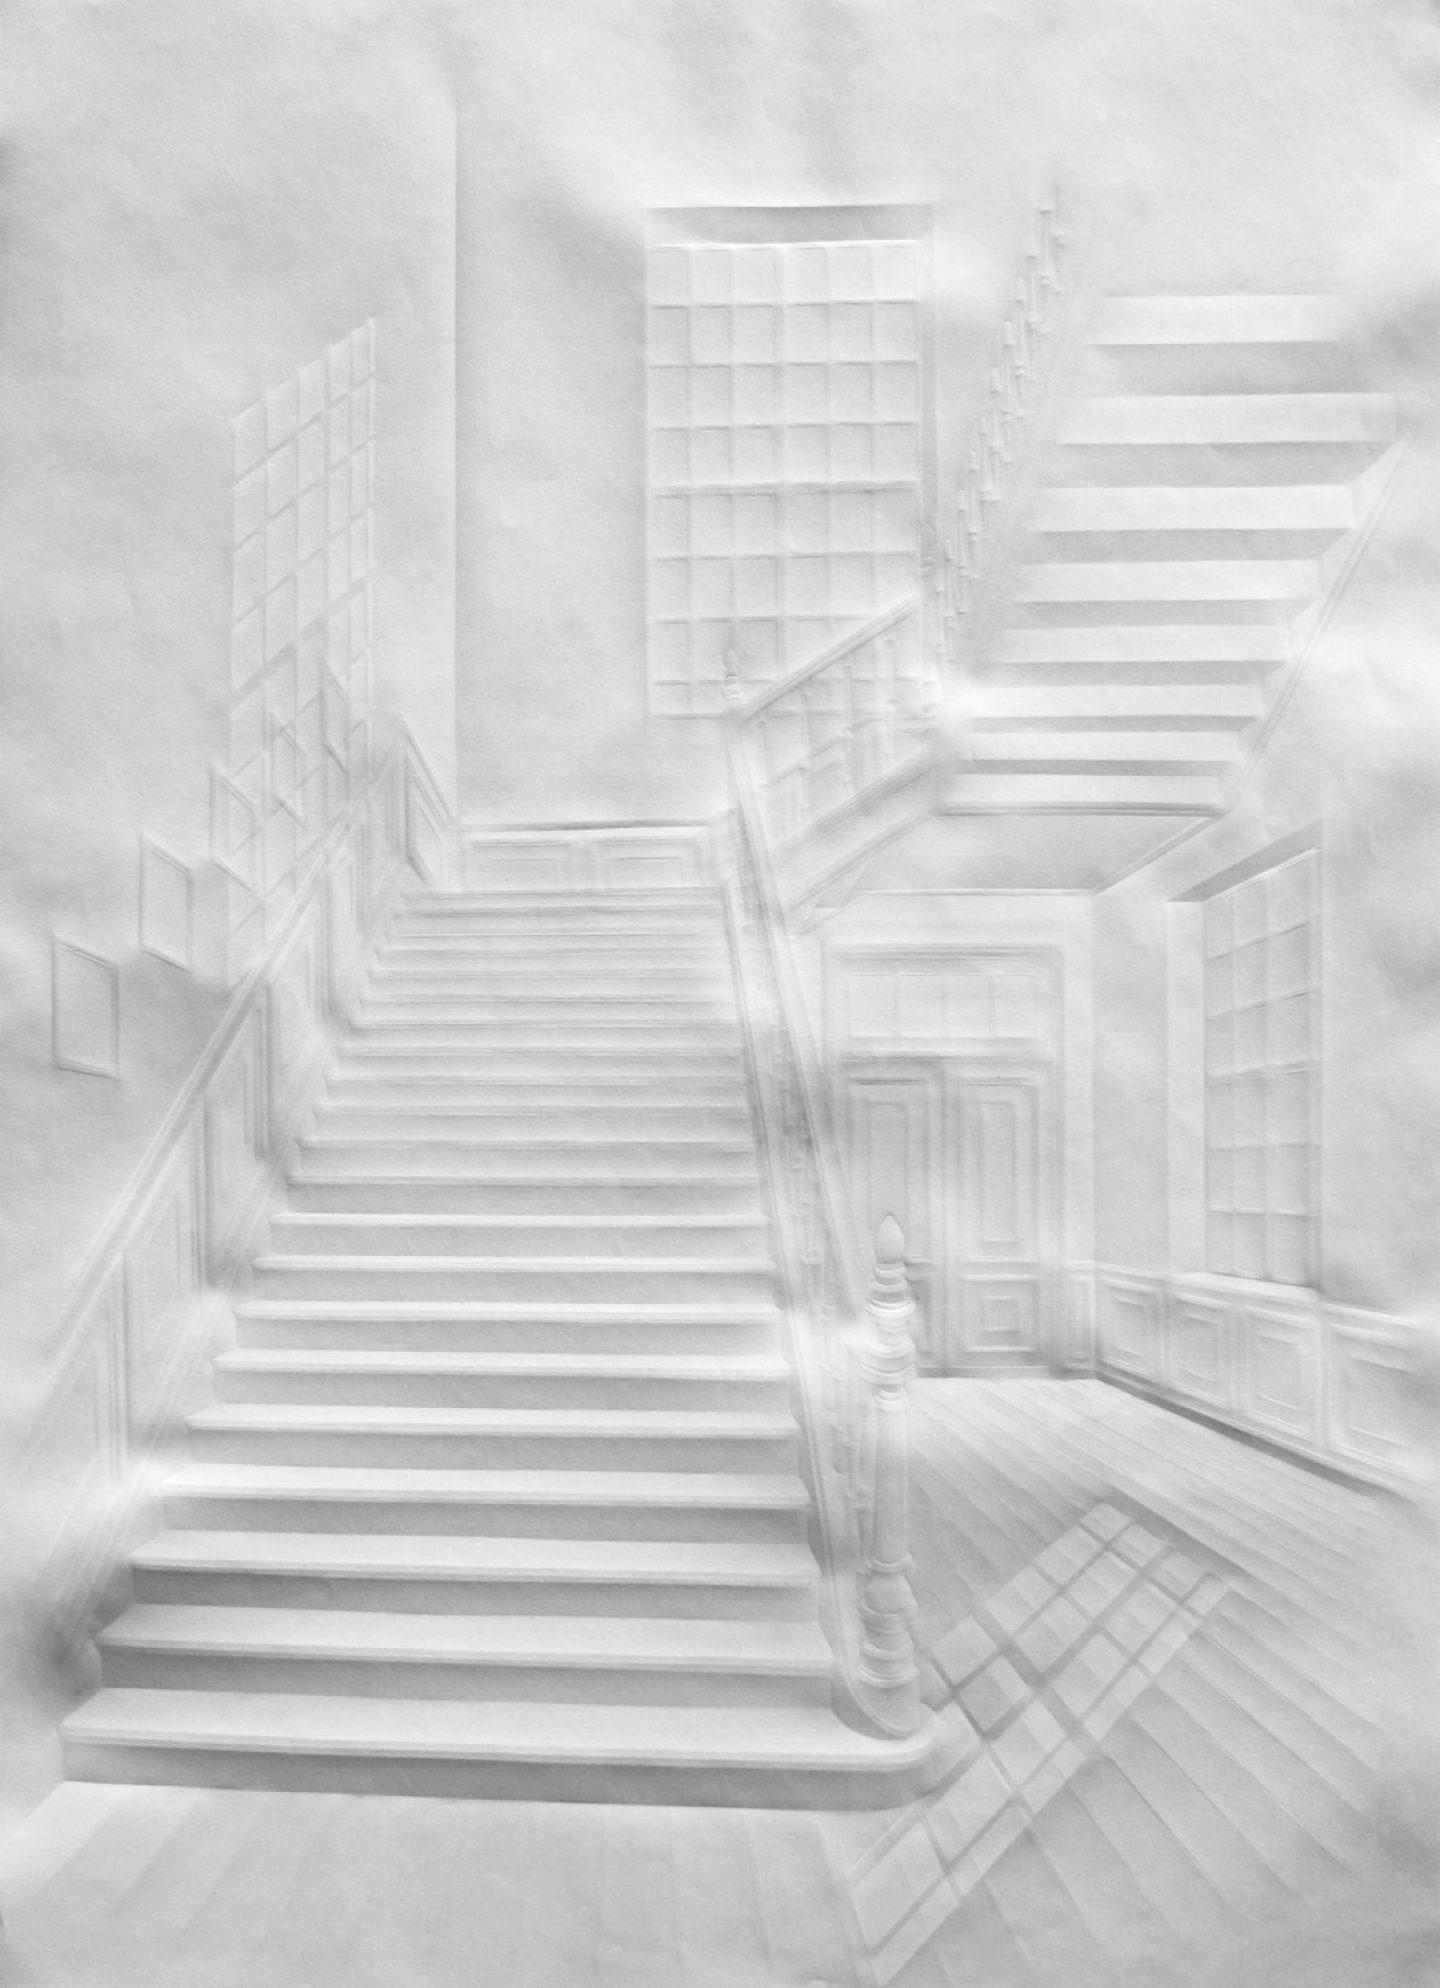 simonschubertohne Titel (Licht im Treppenhaus), 2014, 100cm x 70cm